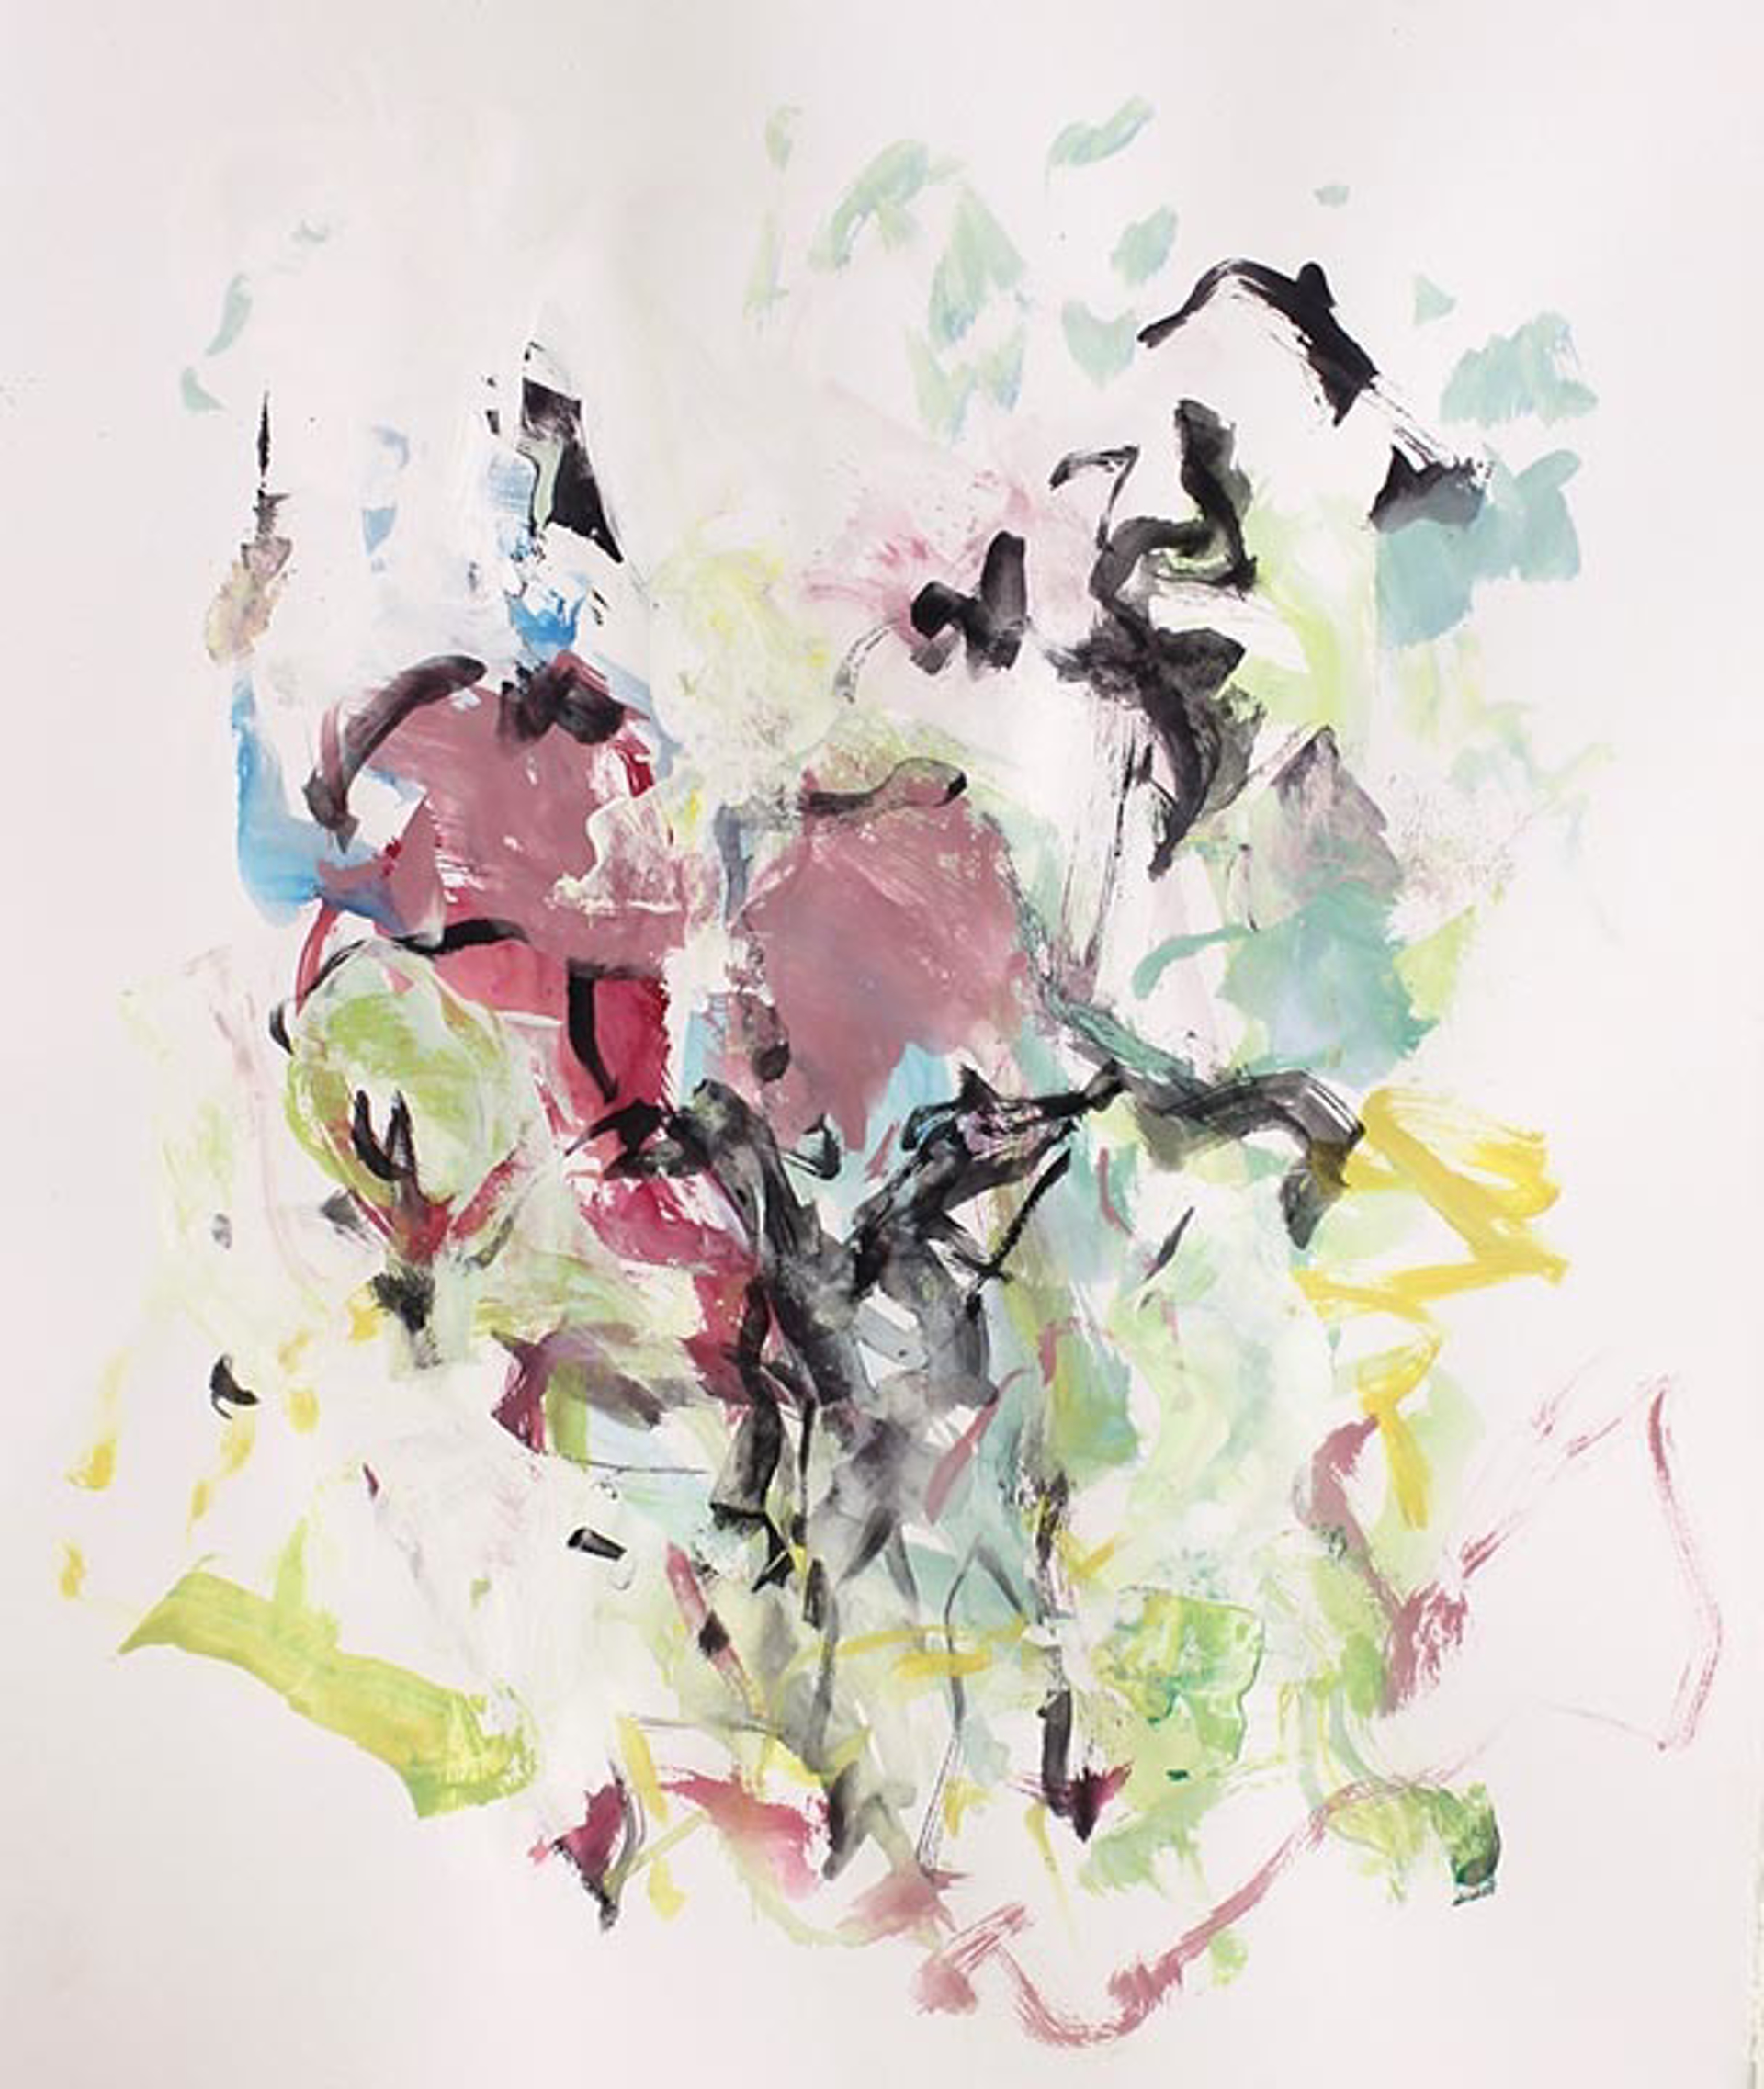 Natural Rhythms 12 by Ryan Cobourn